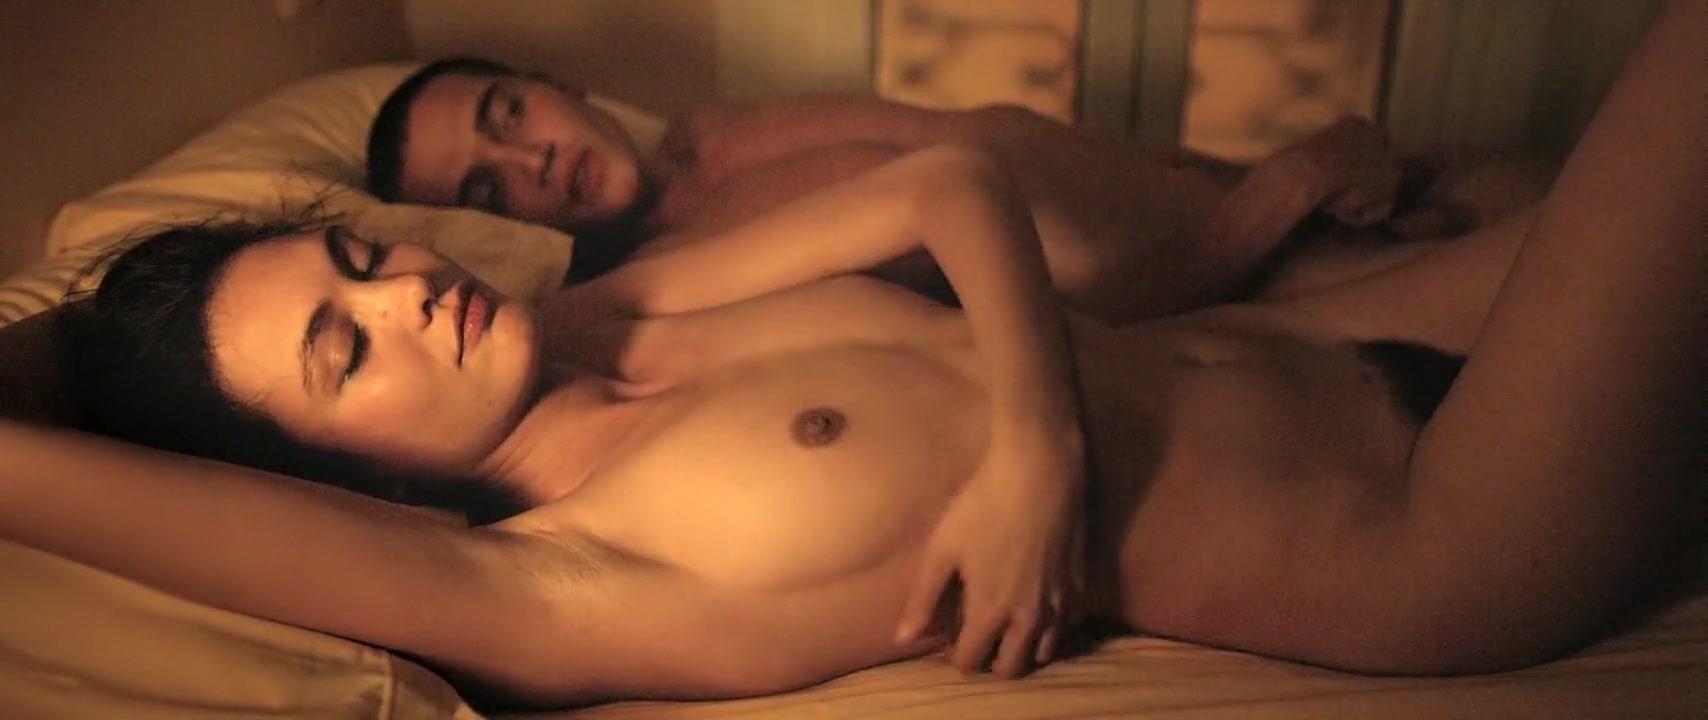 Worldview everlasting dating website Naked Porn tube